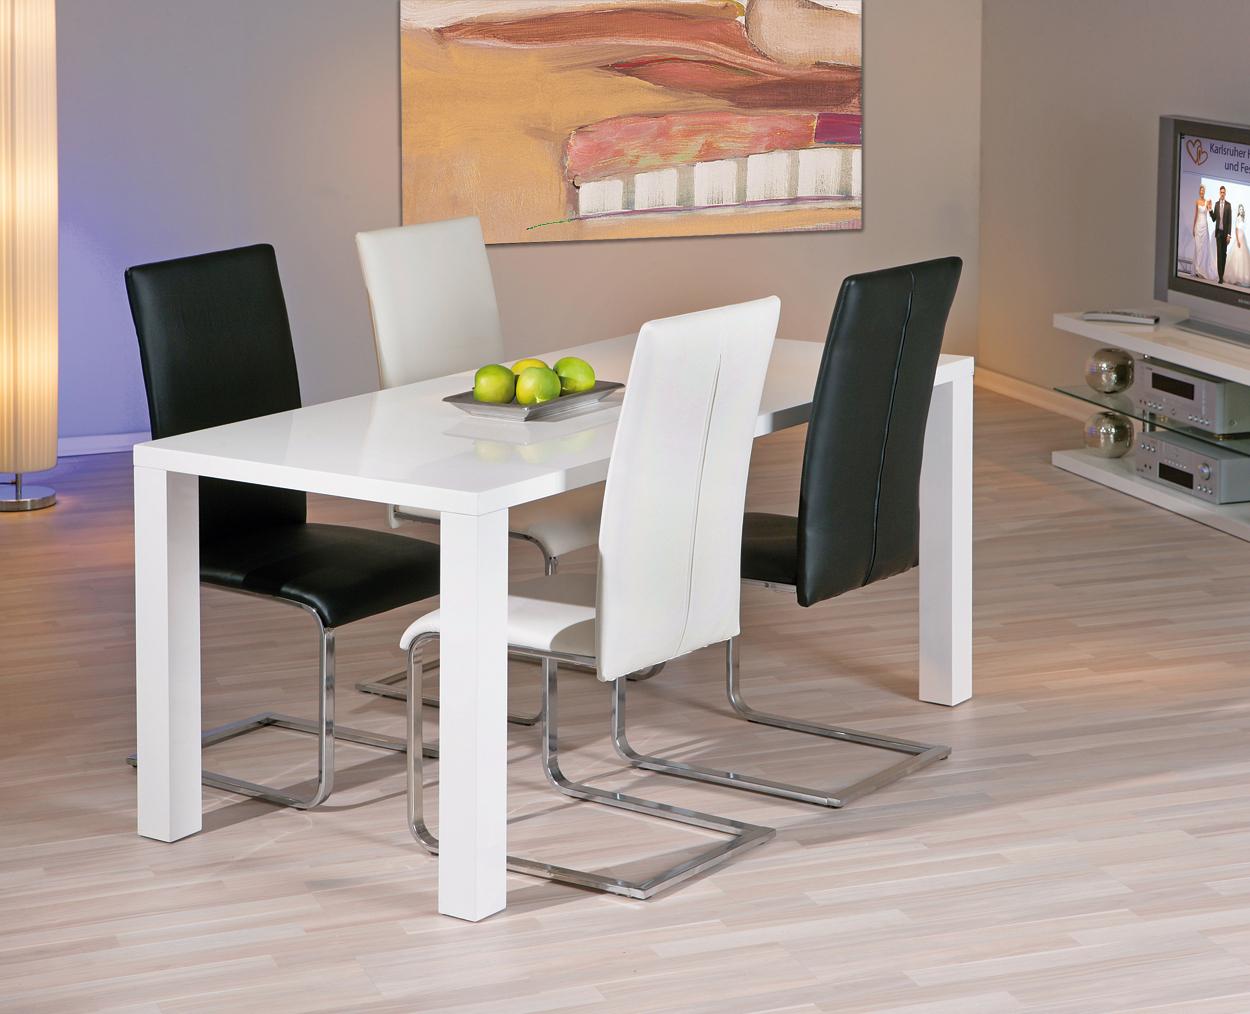 Tavolo moderno bianco moris mobile per cucina sala da pranzo for Tavolo cucina bianco